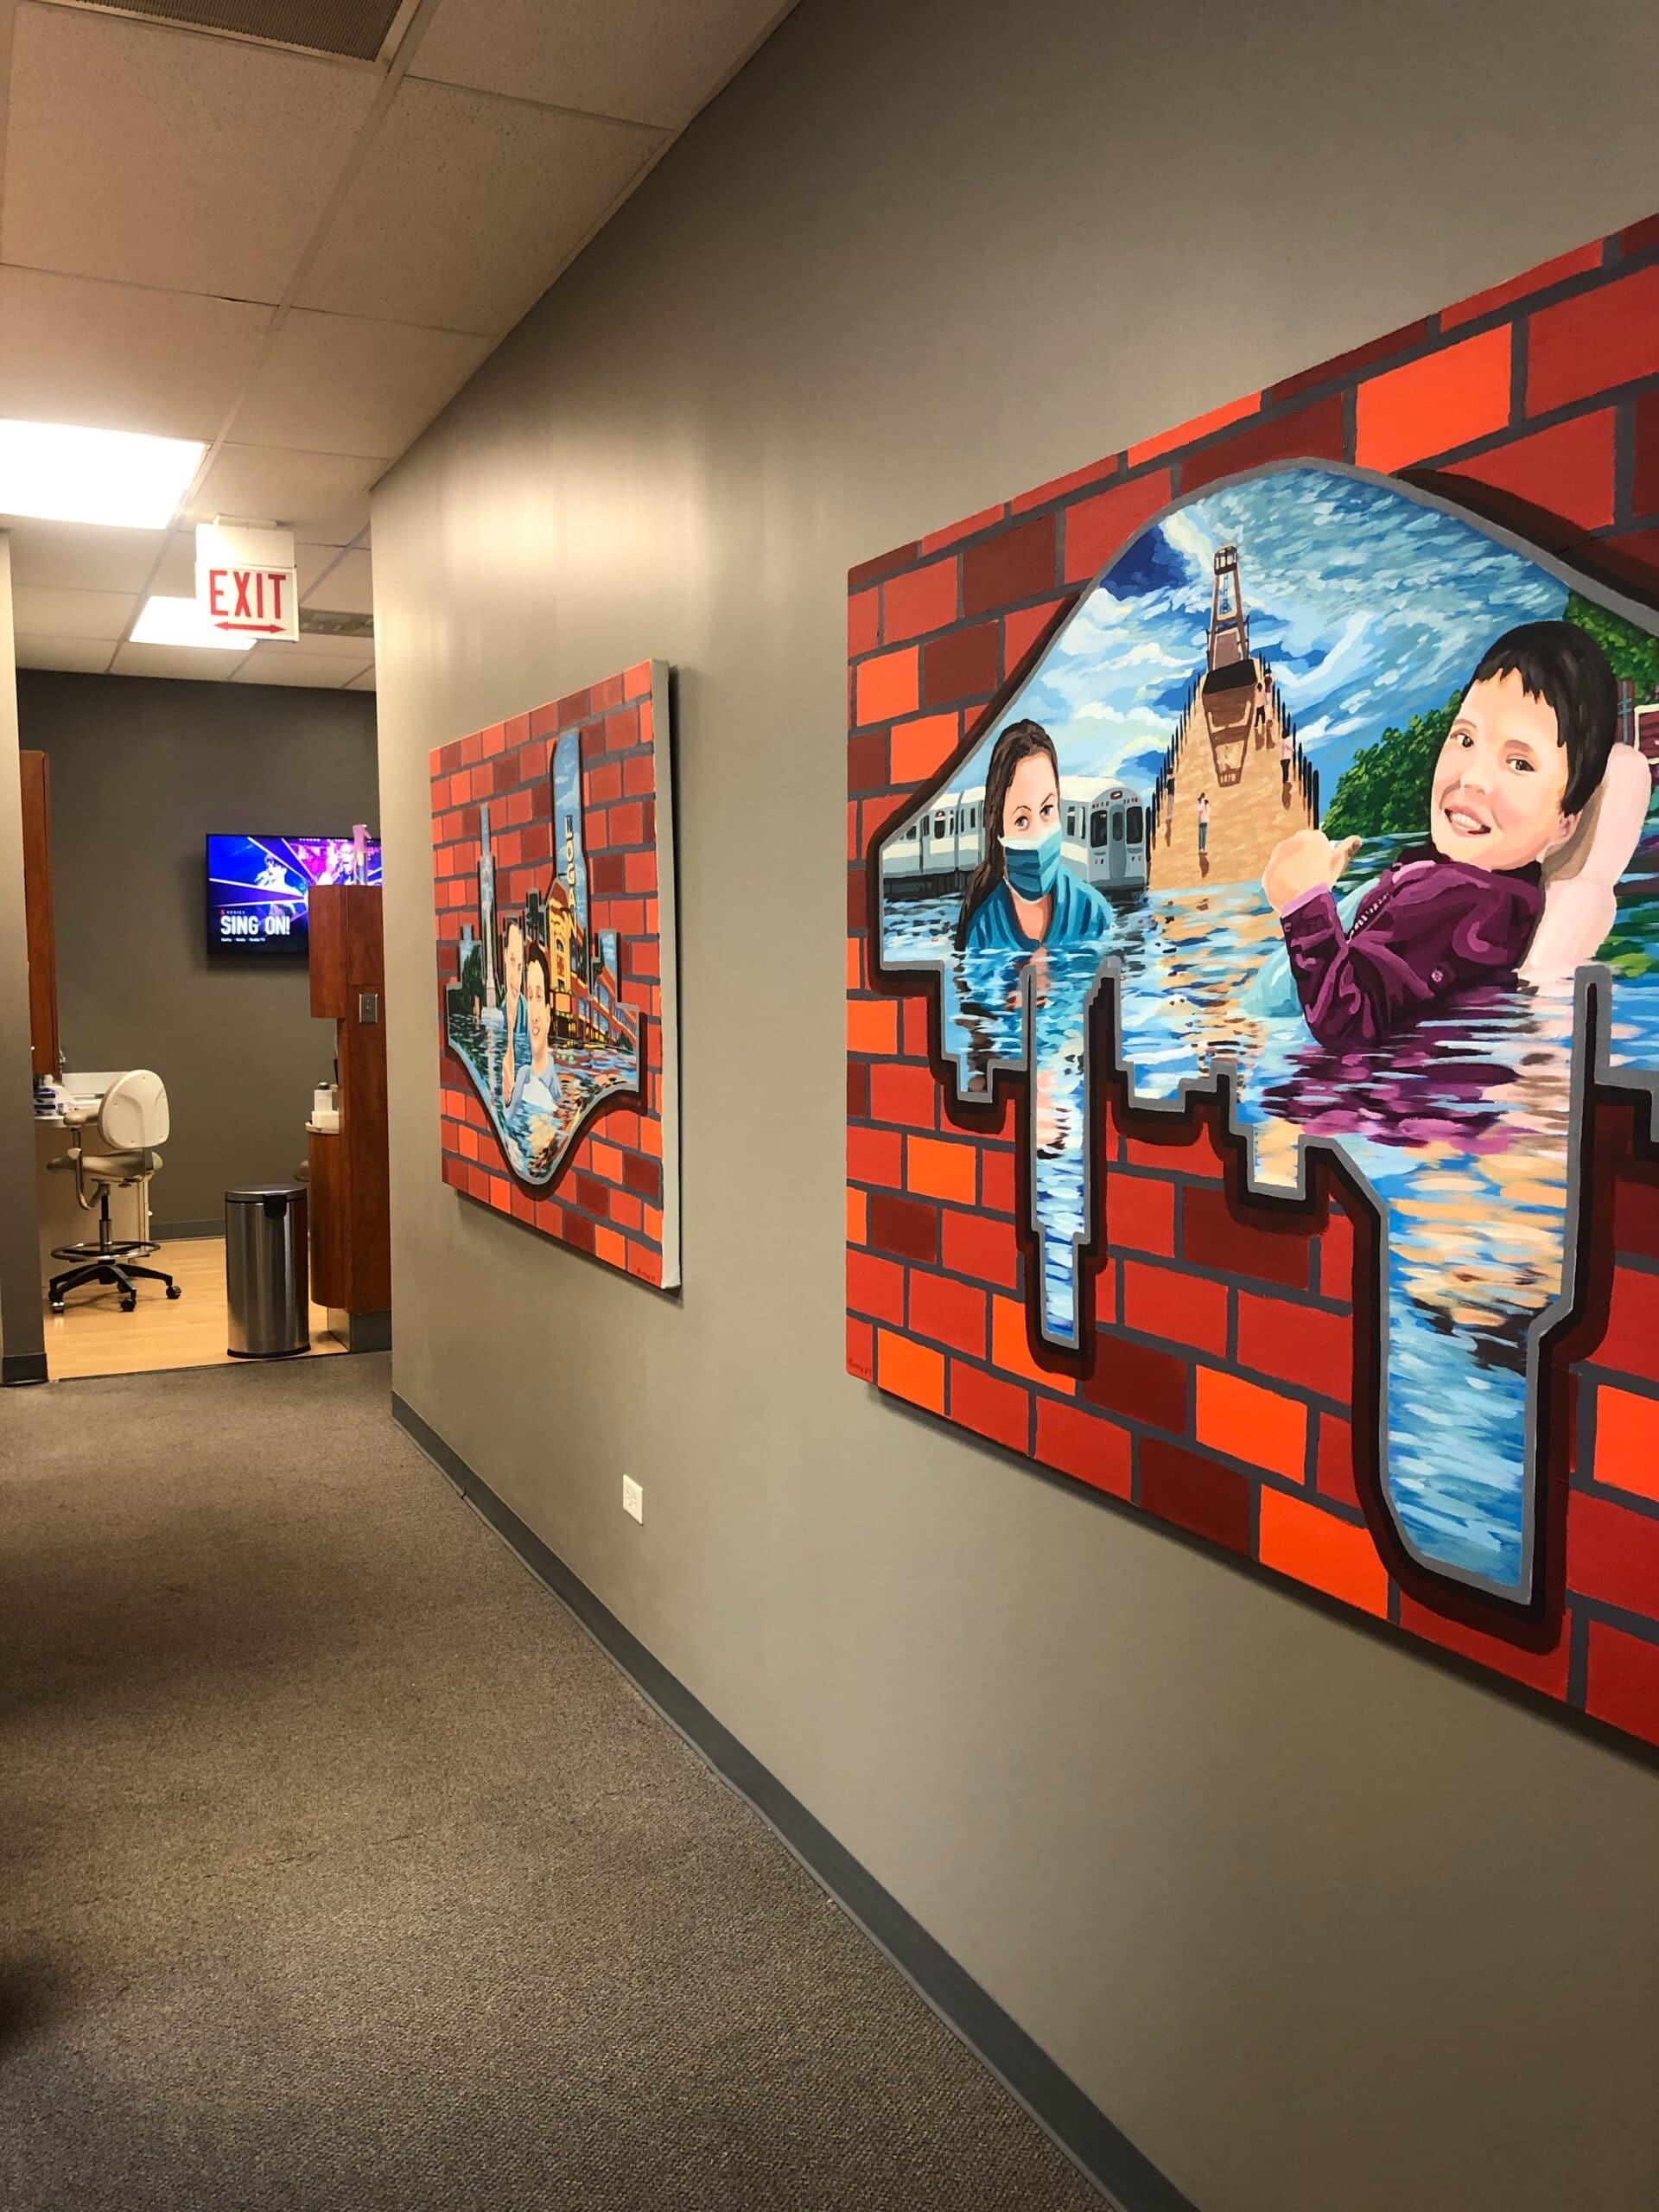 Dentist Office California Ave Hallway art